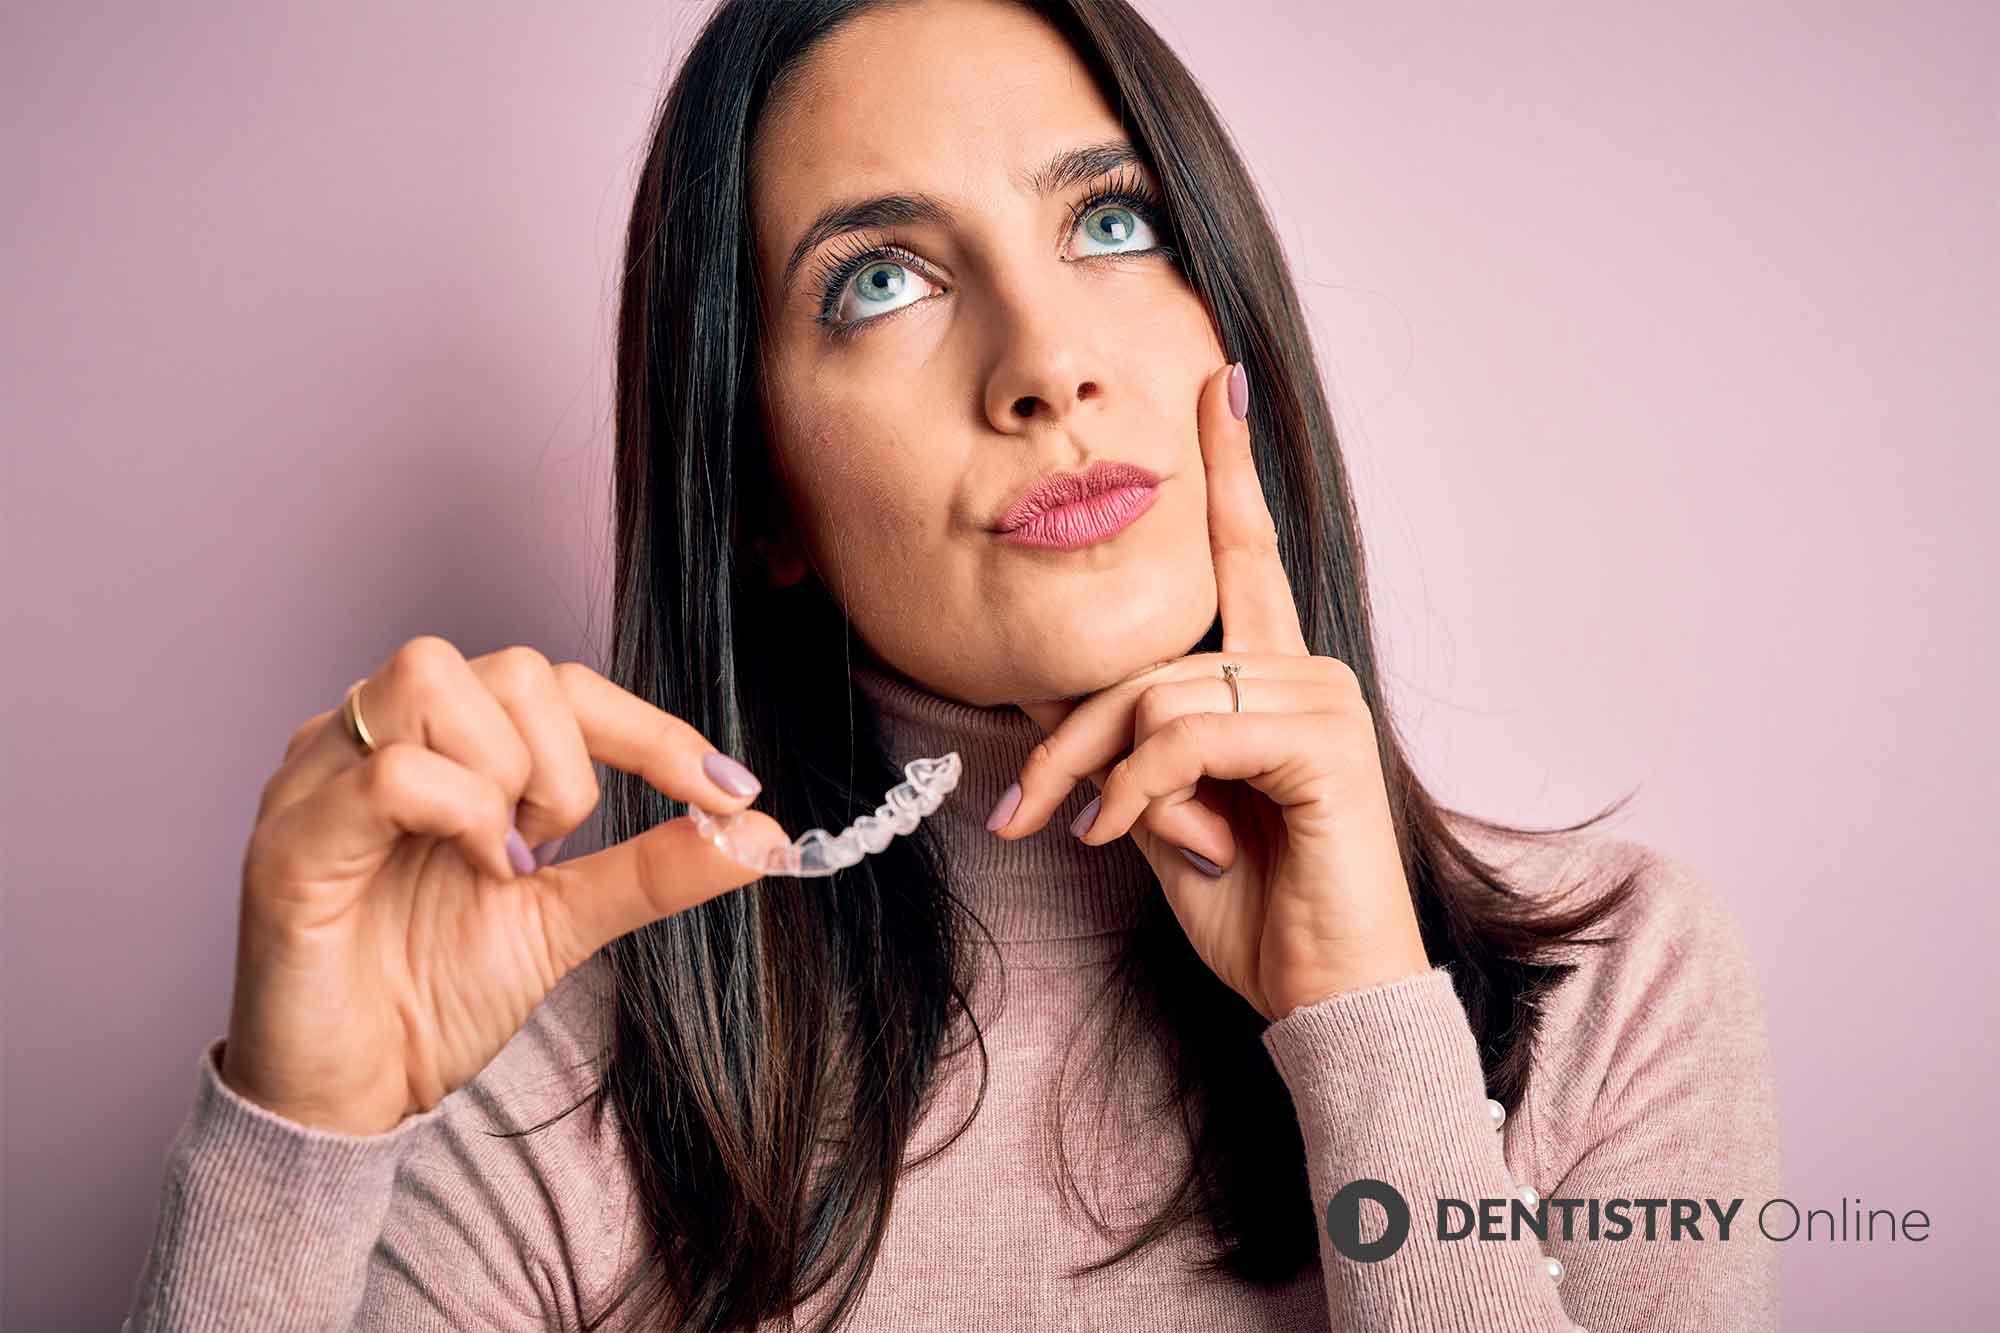 DIY orthodontcics